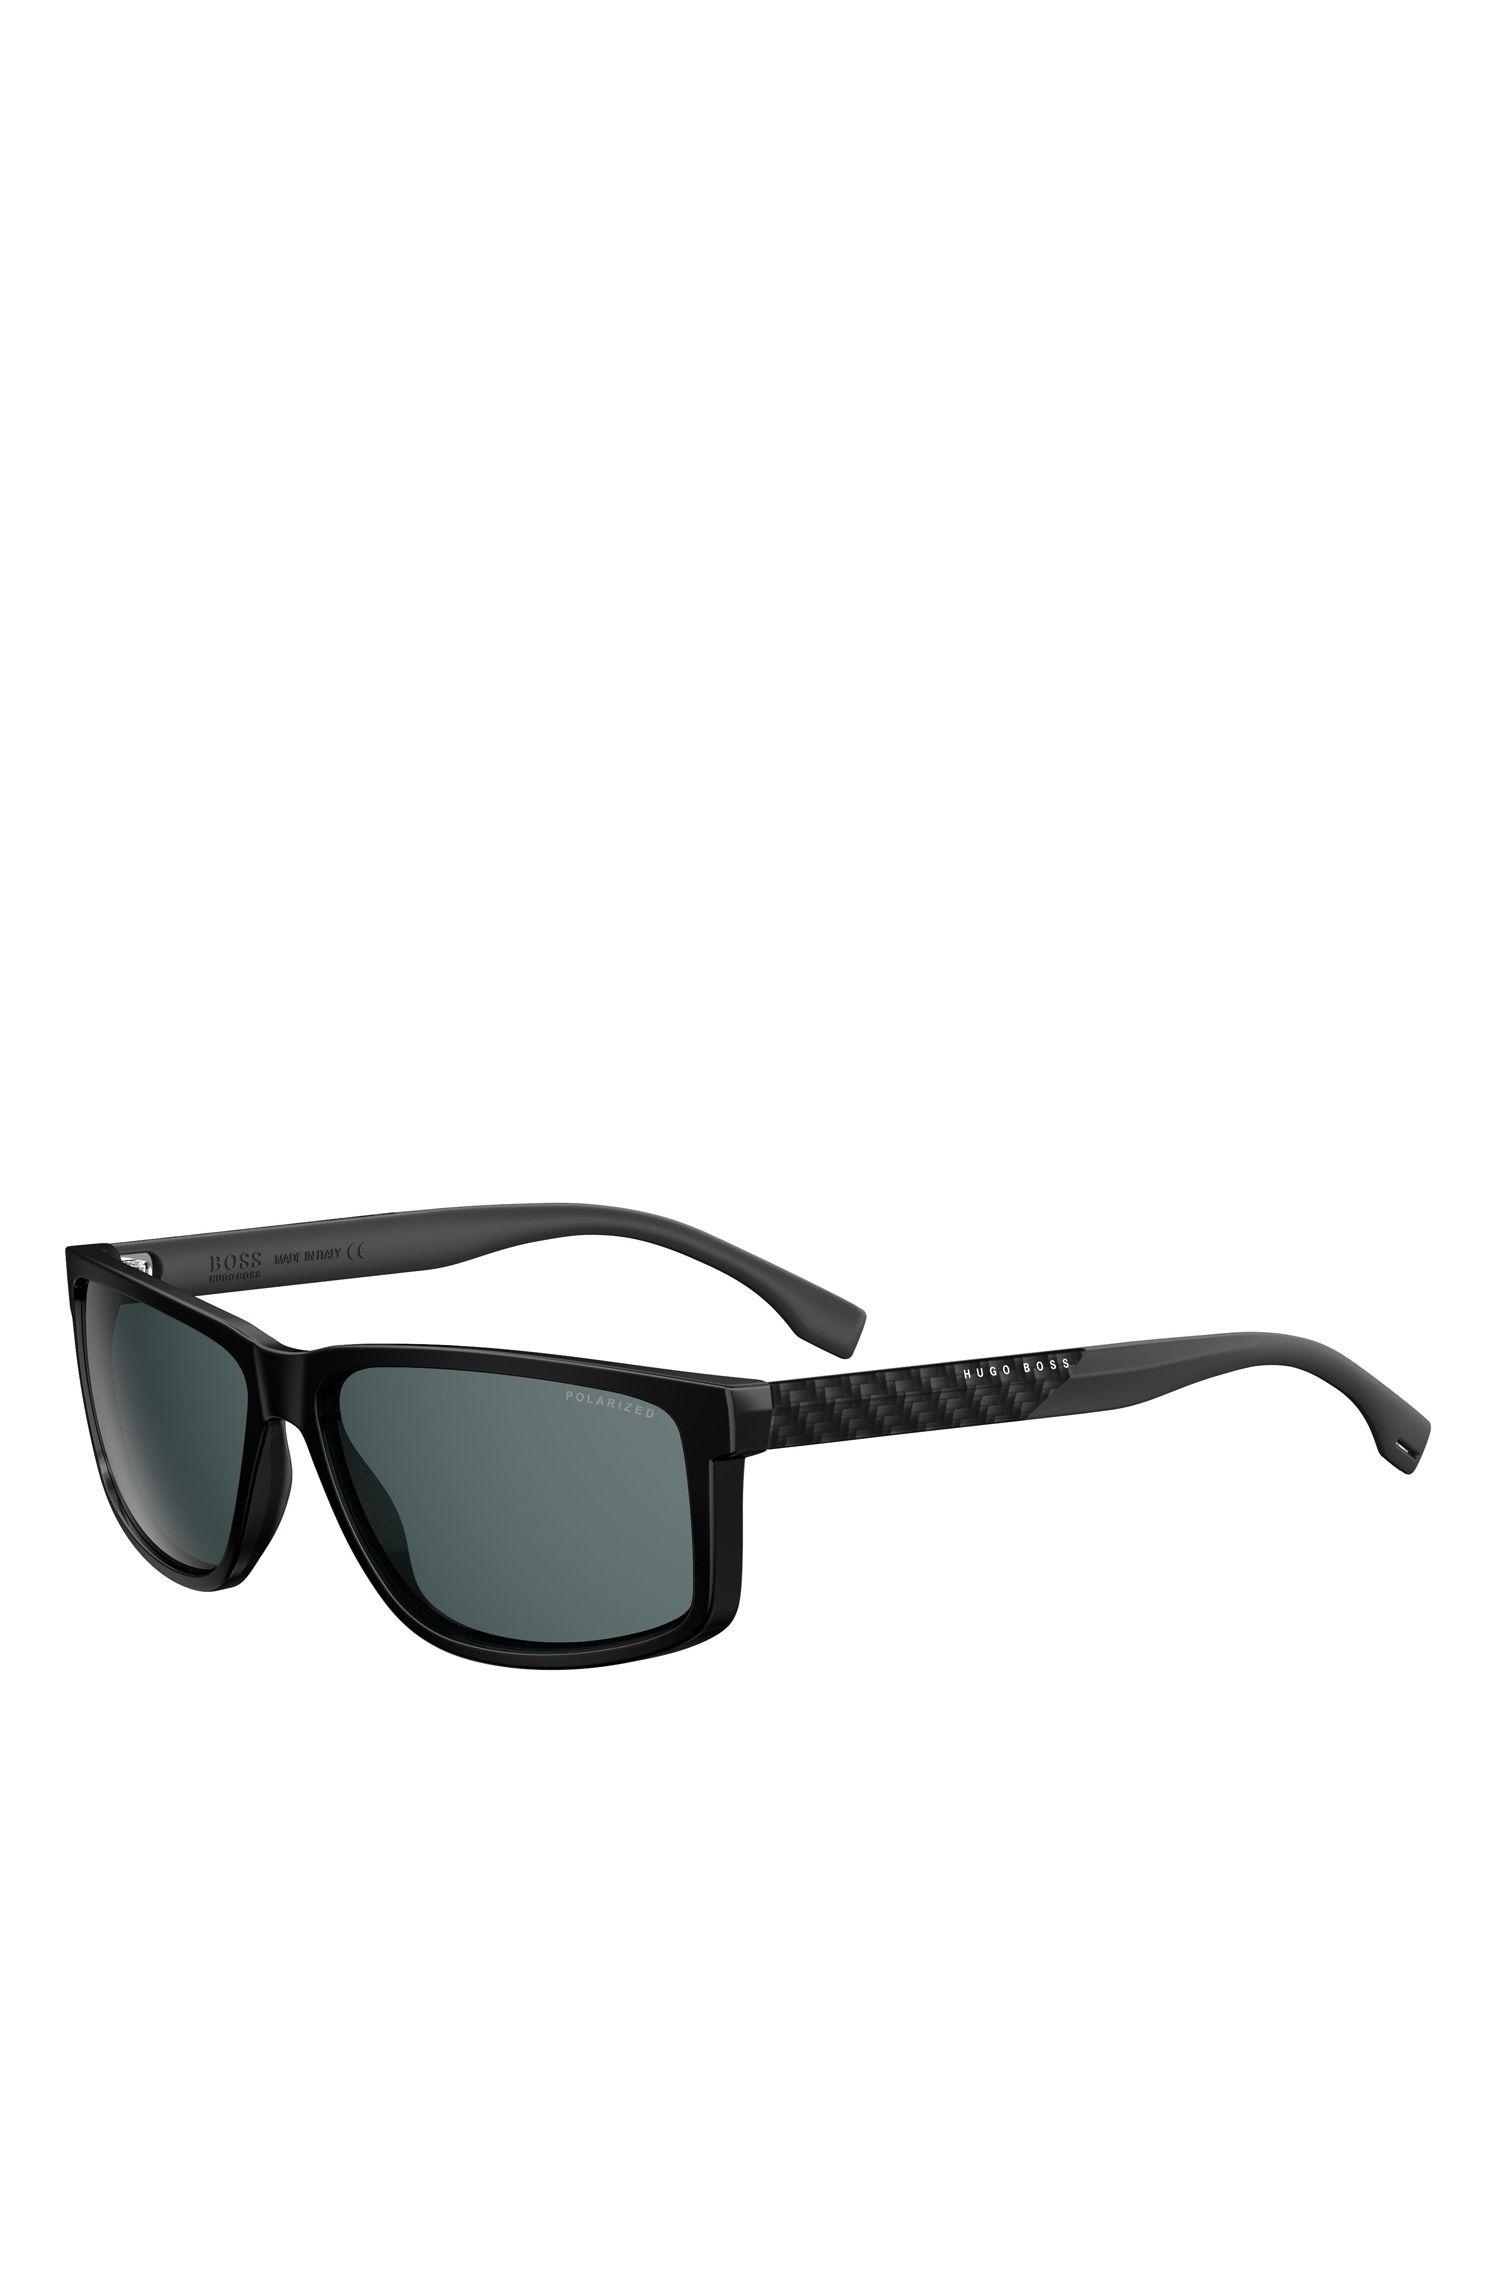 'BOSS 0879' | Dark Grey Carbon Fiber Rectangular Sunglasses